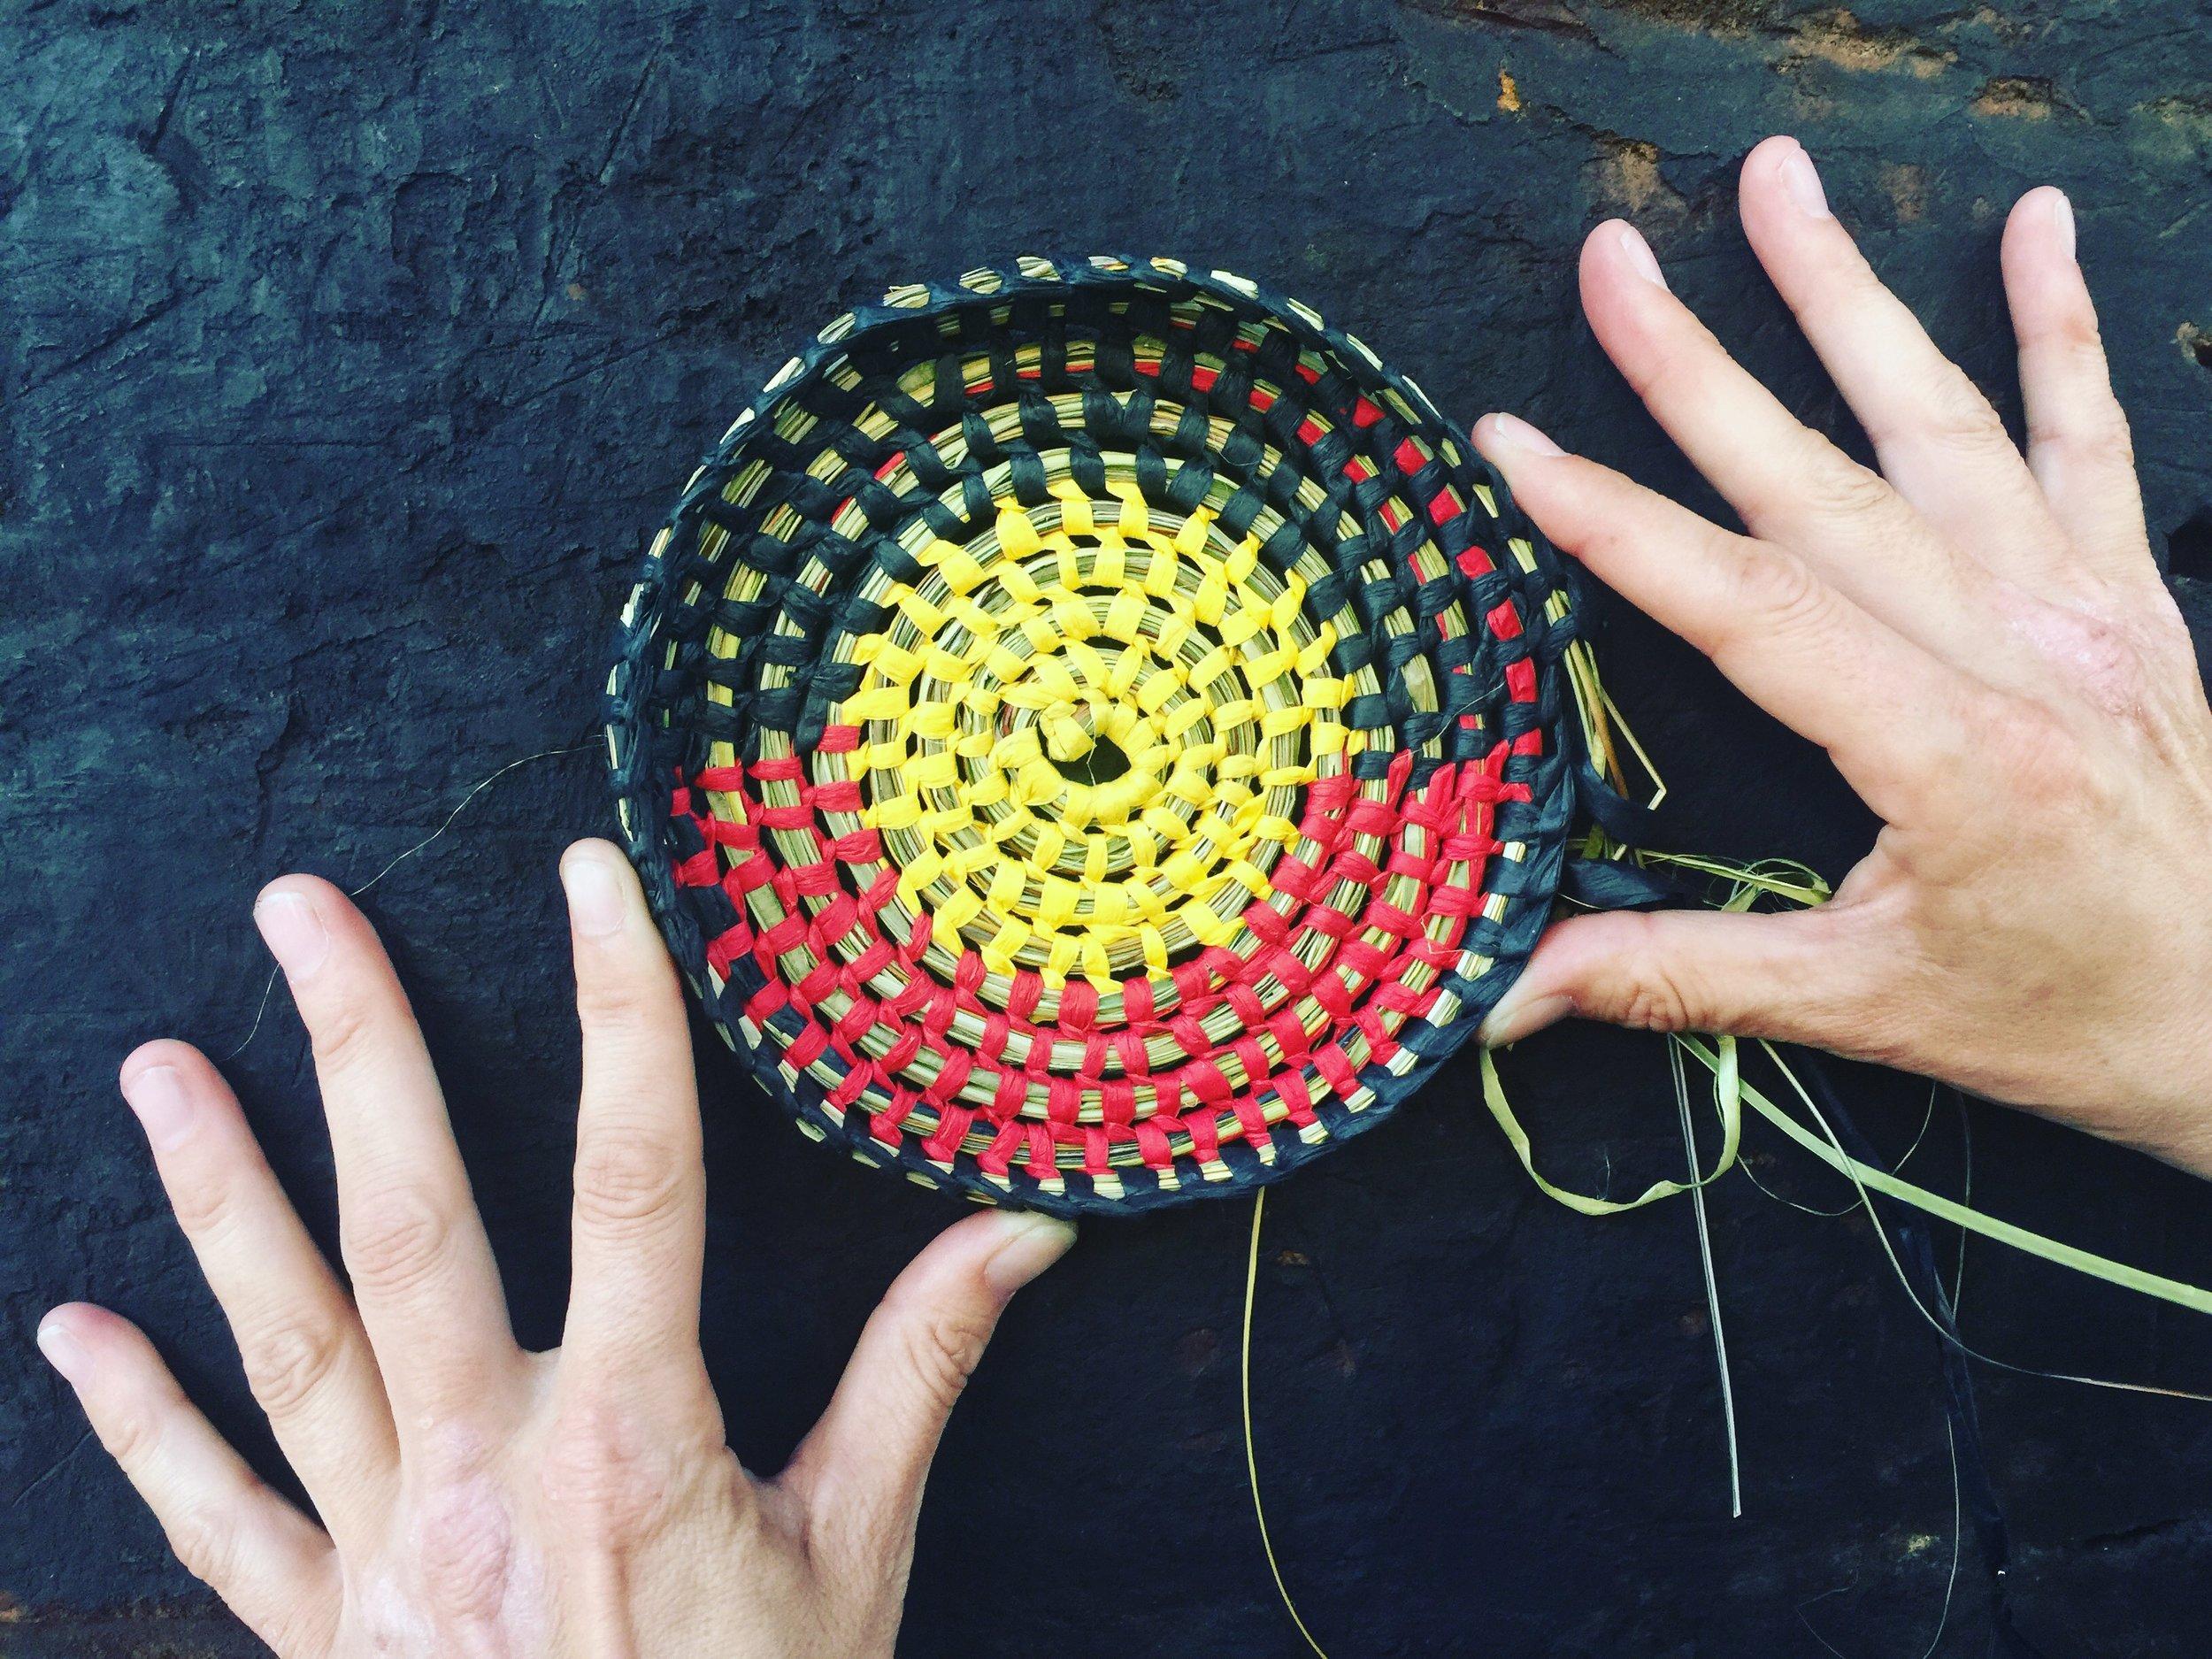 Donna Blackall, Weaving at Black Arts Market, Carriageworks